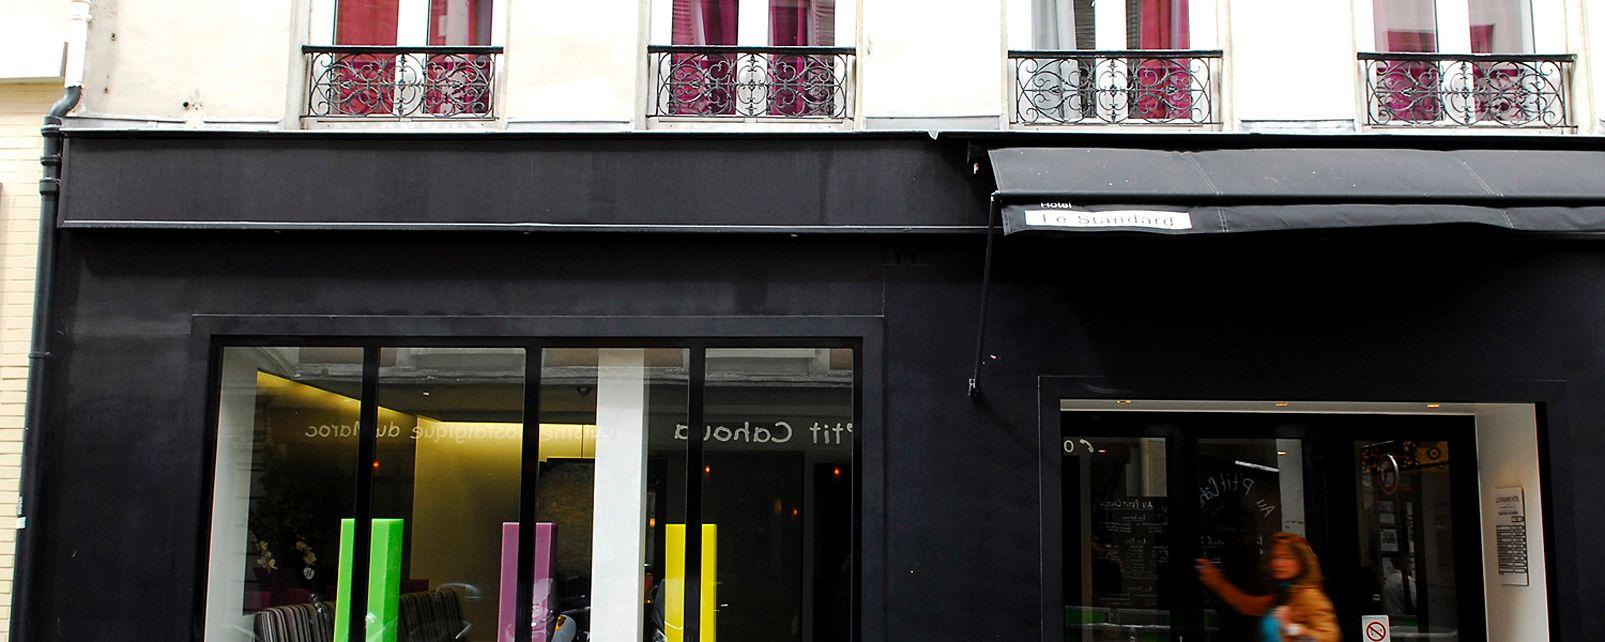 Hôtel Le Standard